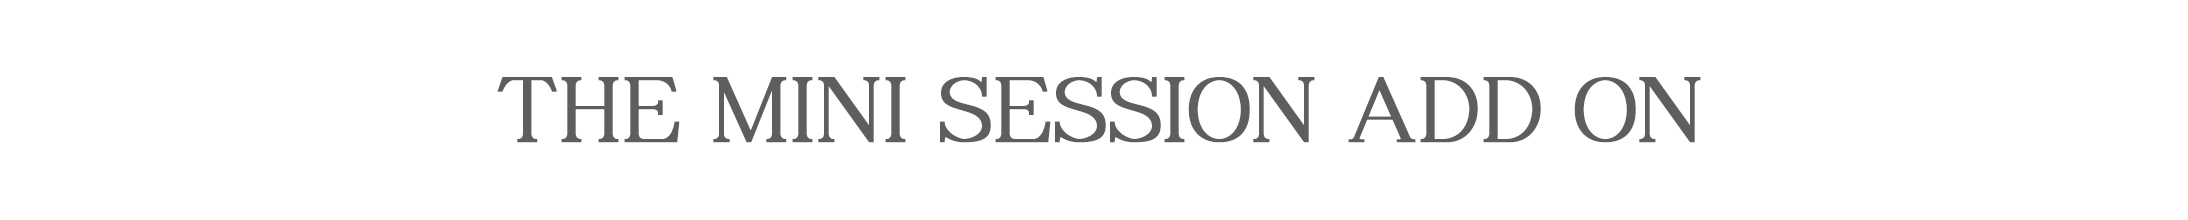 The mini session add on.jpg